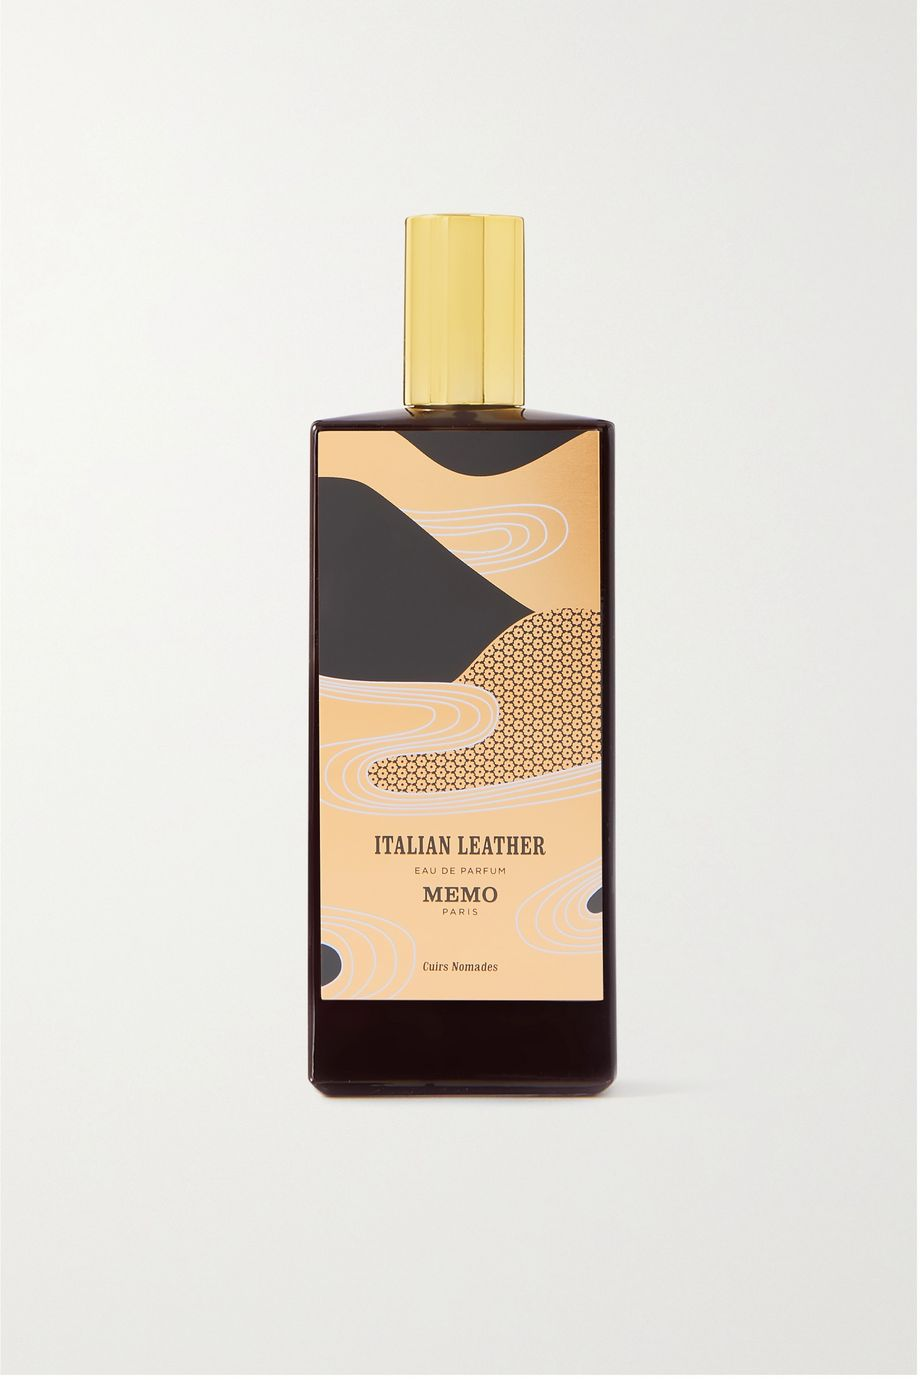 Memo Paris Eau de parfum Italian Leather, 75 ml